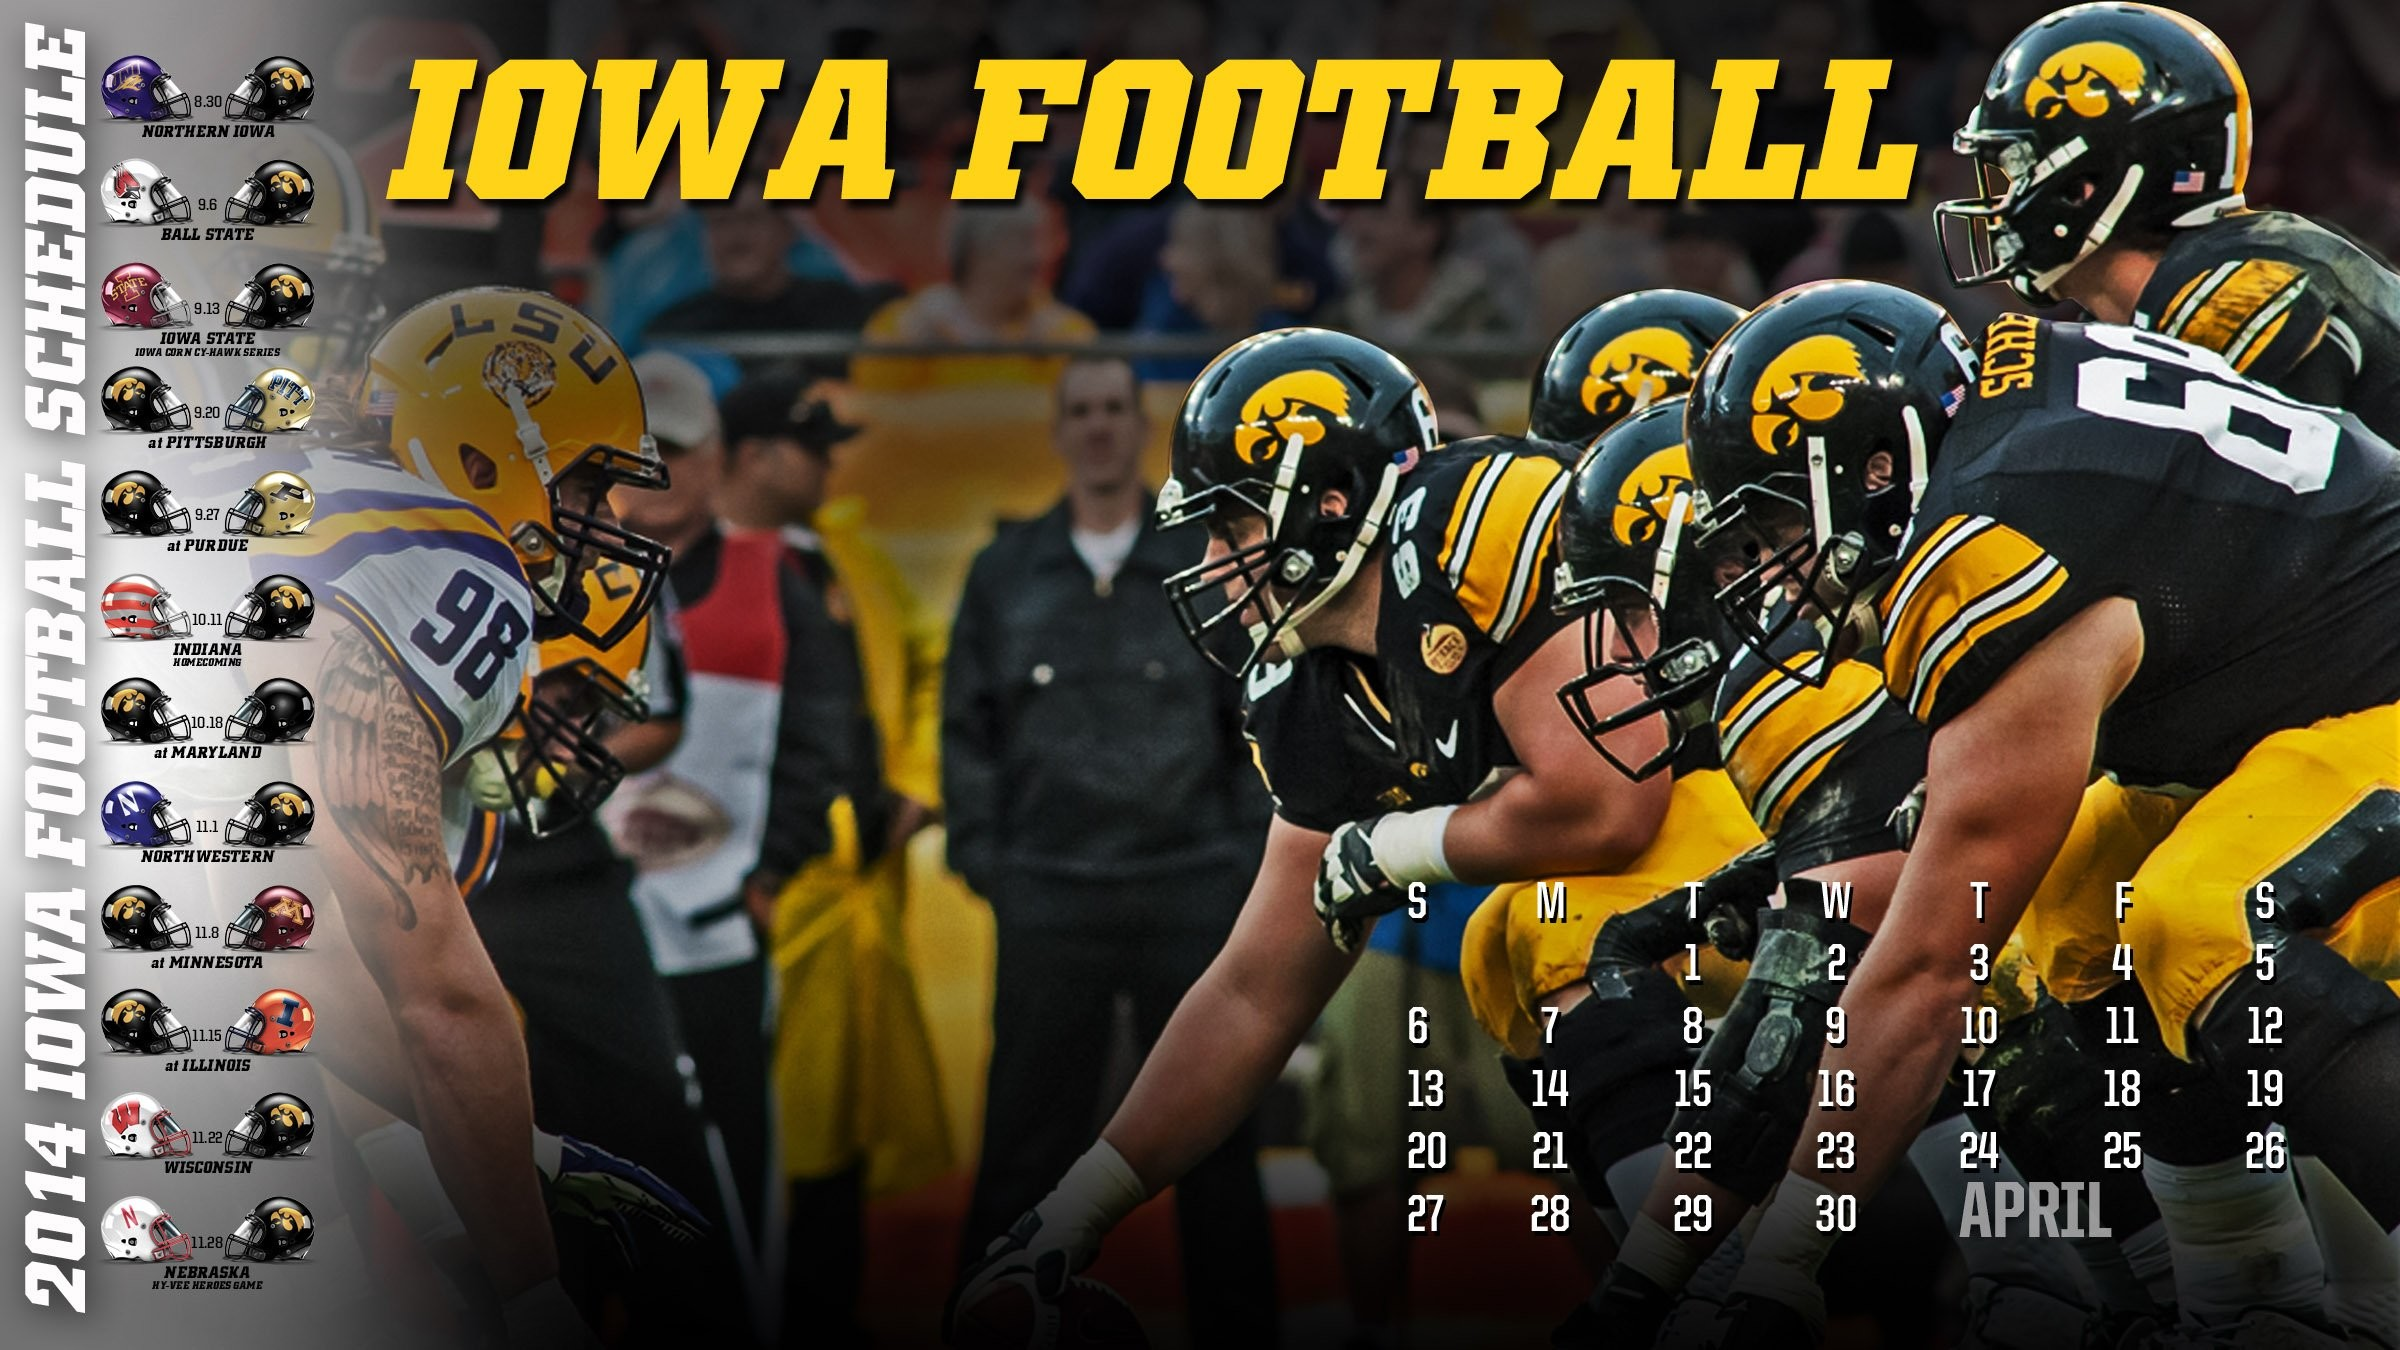 IOWA HAWKEYES college football wallpaper     597205   WallpaperUP